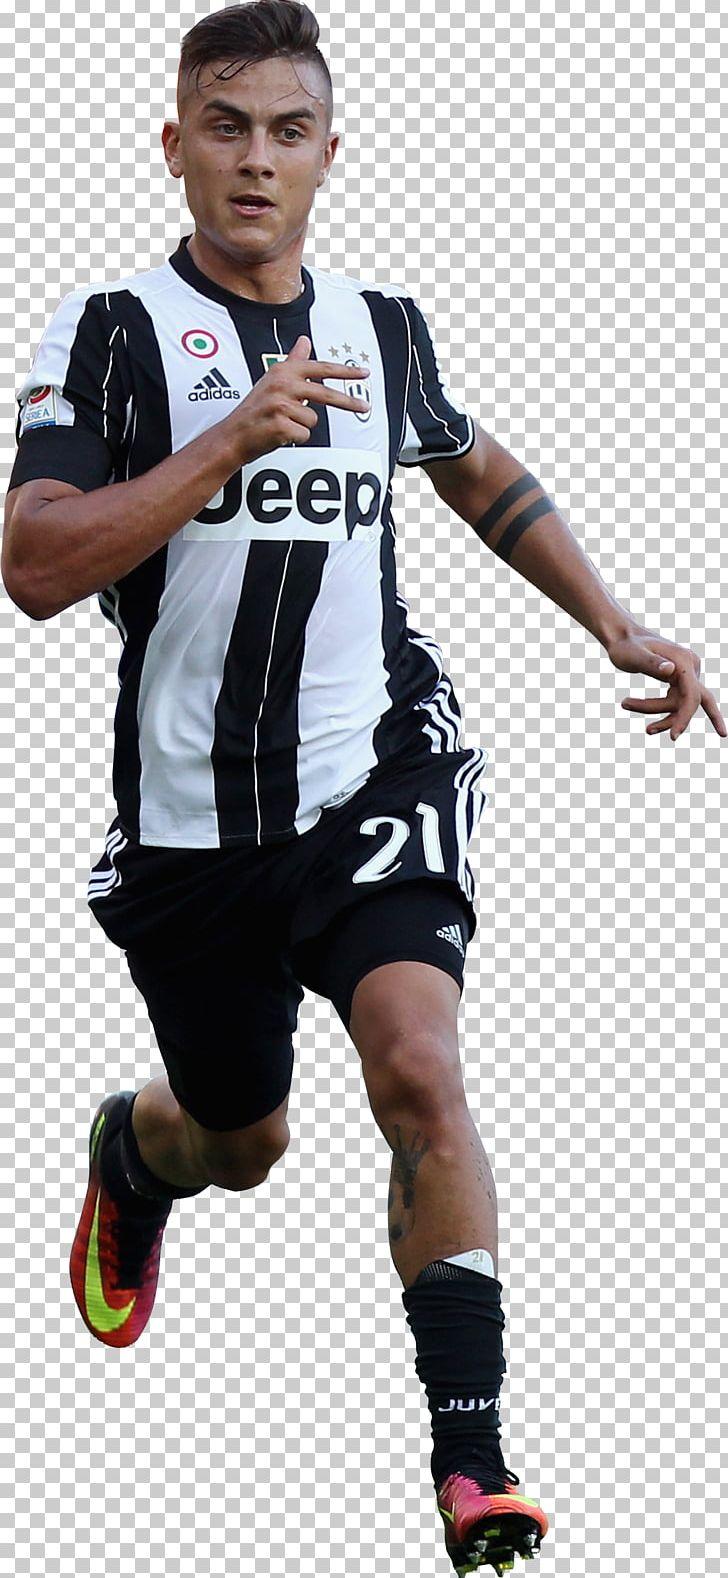 pretty nice 90916 21353 Paulo Dybala Juventus F.C. Jersey Football Player PNG ...